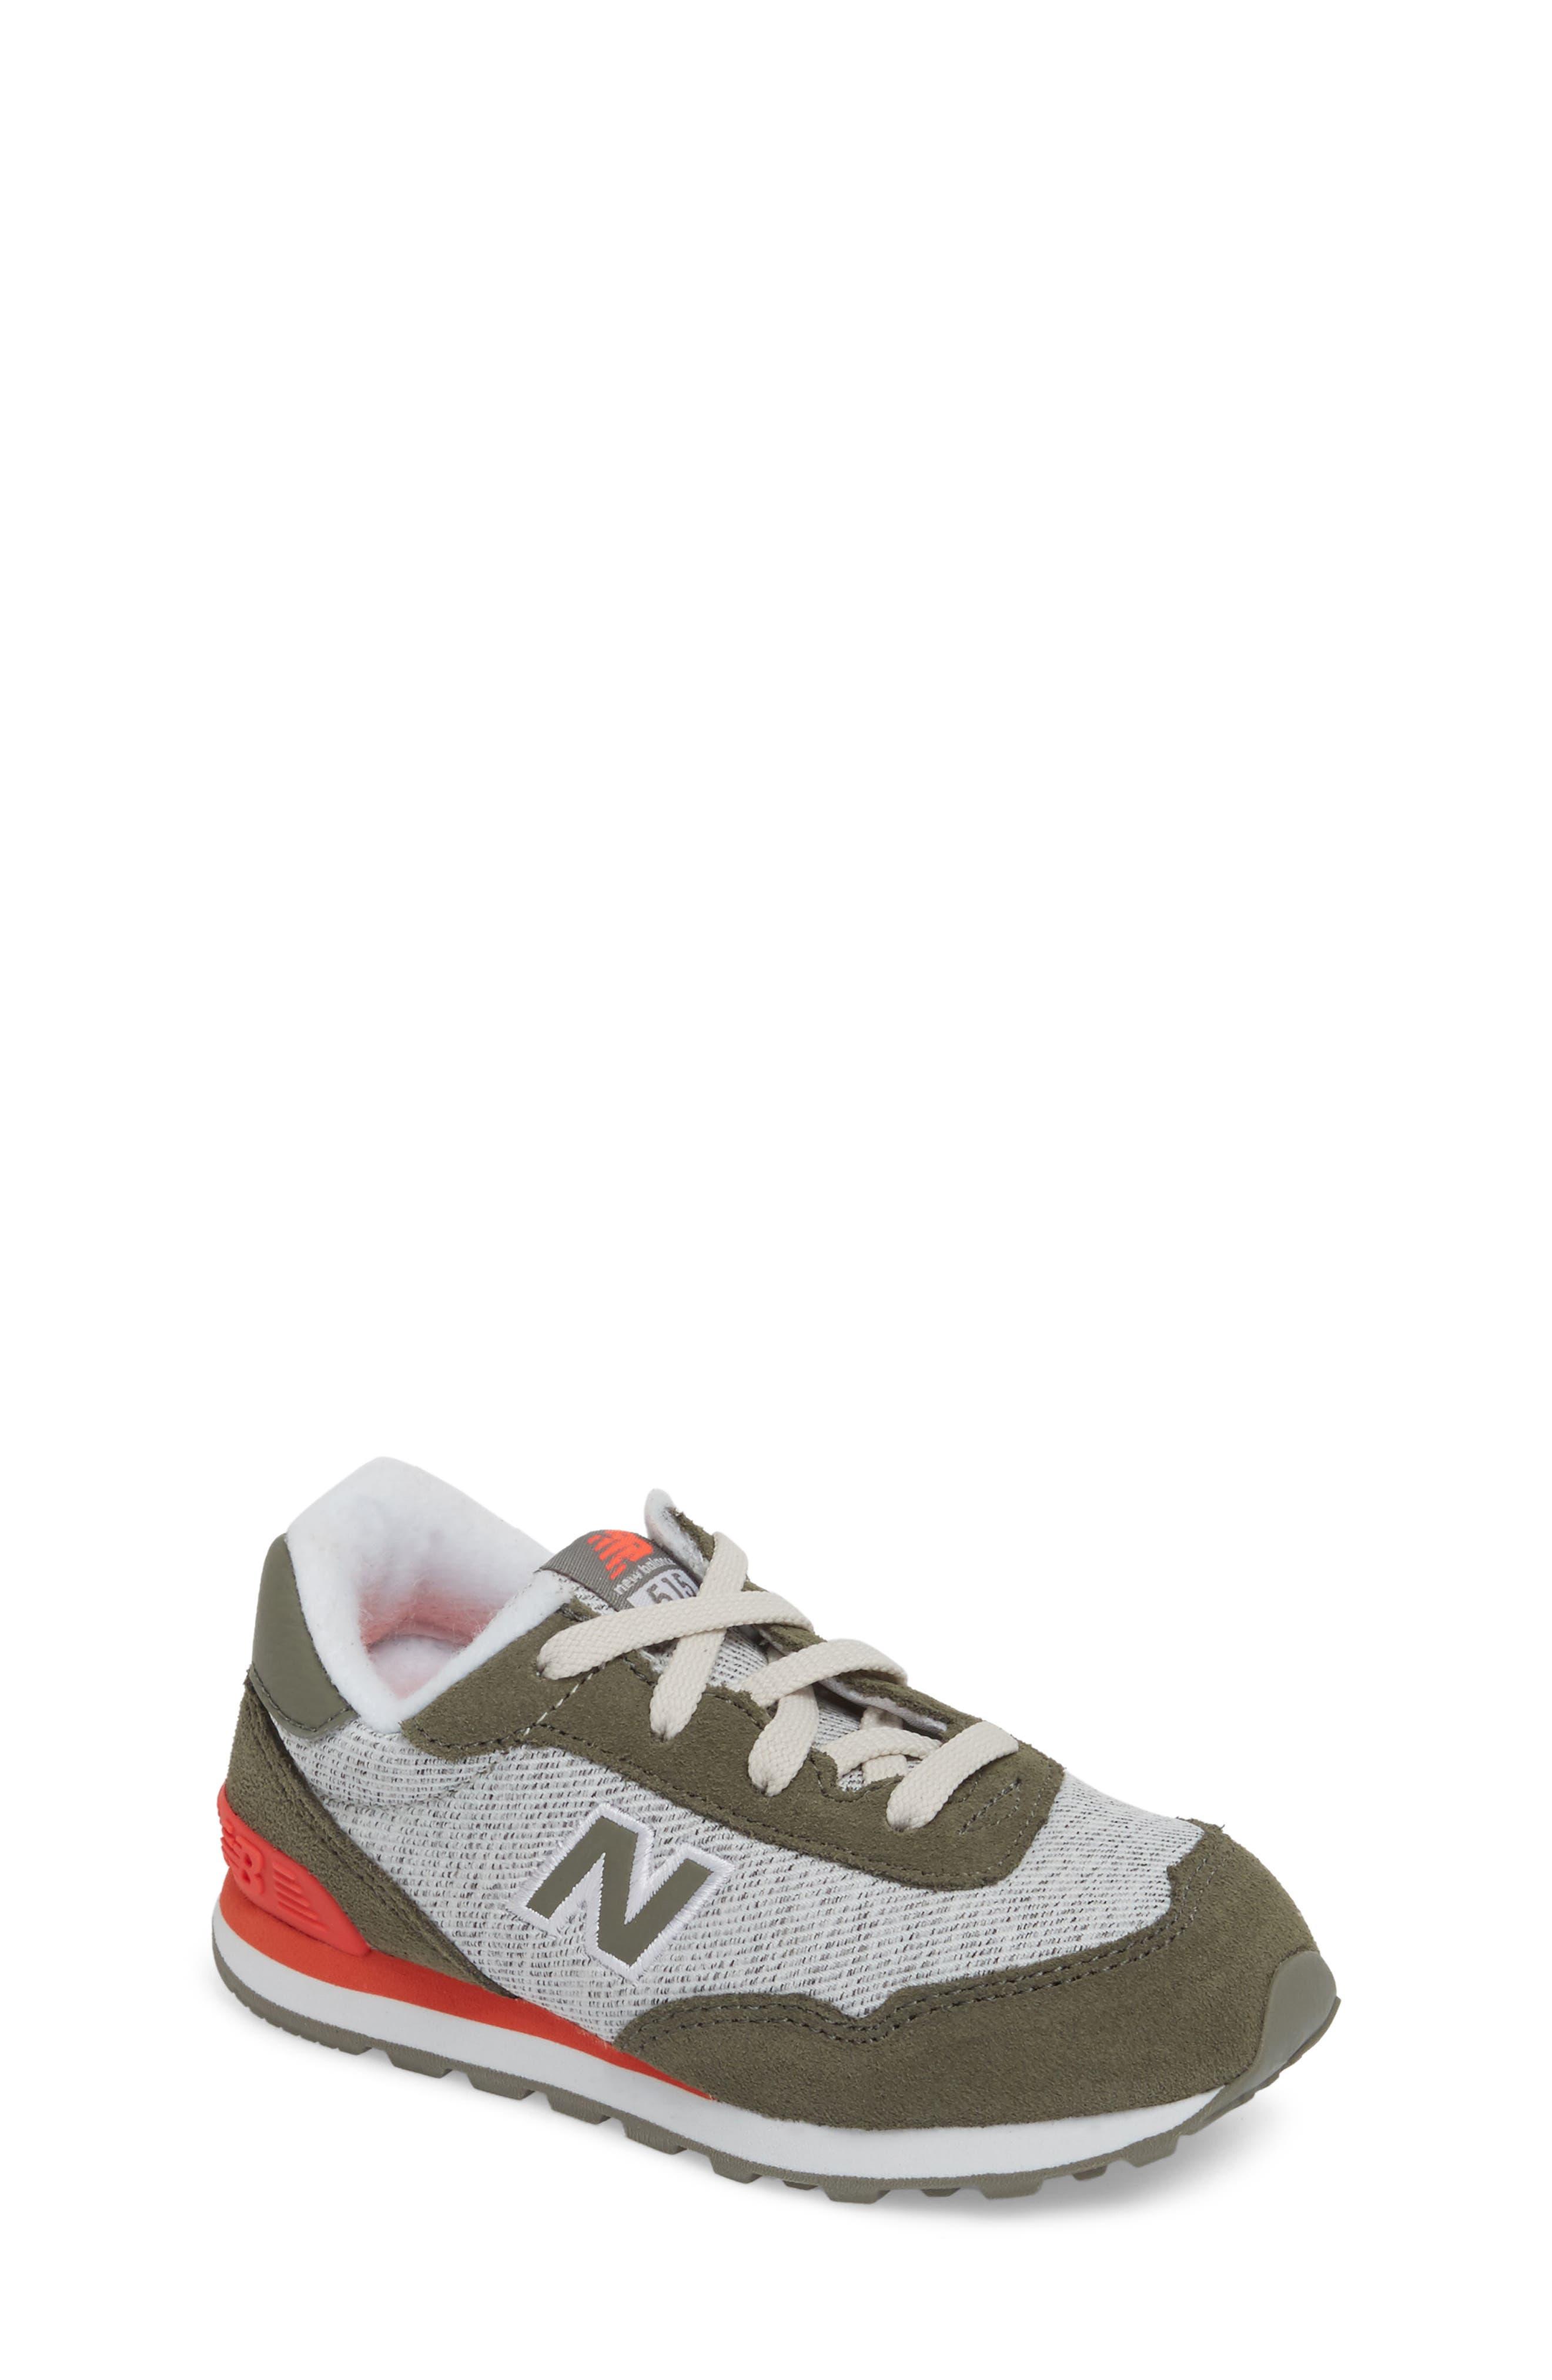 515 Sneaker,                             Main thumbnail 1, color,                             305